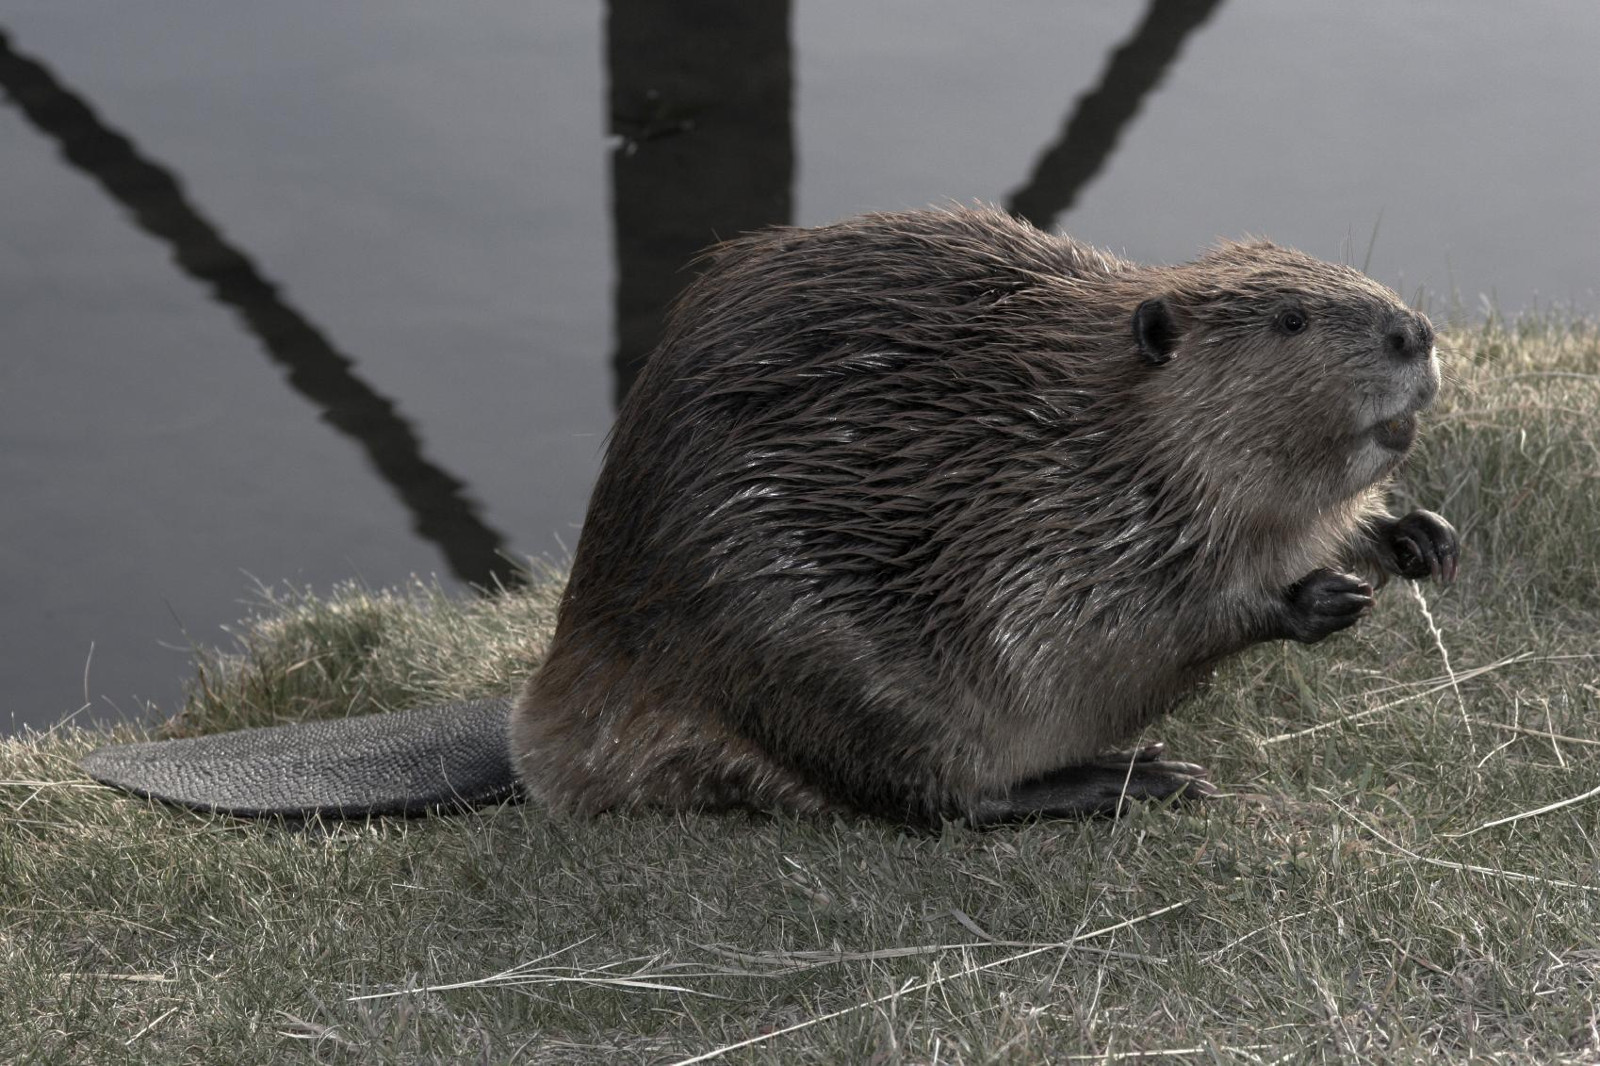 Podcast Highlight: Busy as a Beaver